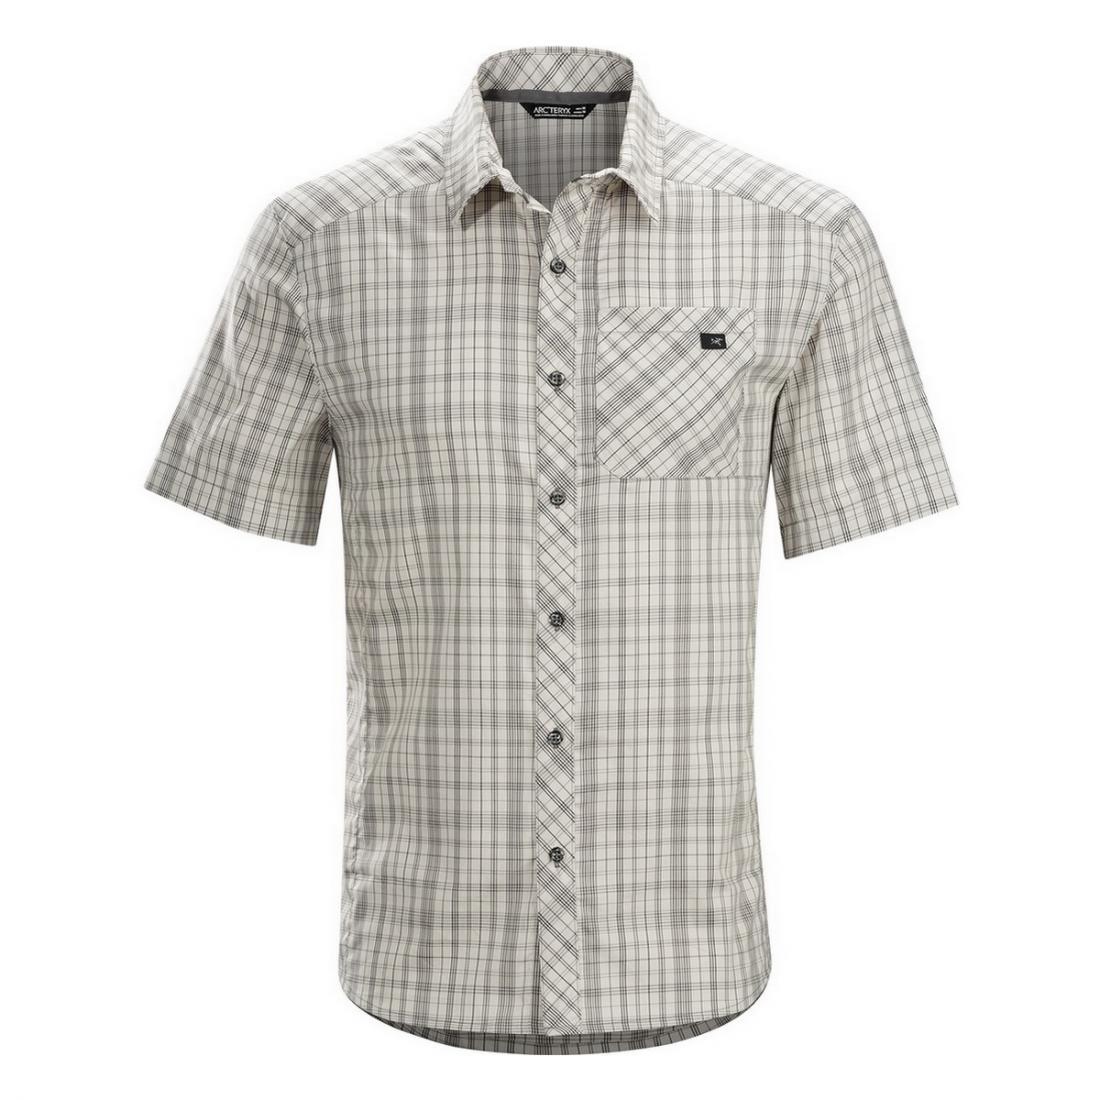 Рубашка Peakline Shirt SS муж.Рубашки<br><br><br>Цвет: Серый<br>Размер: L